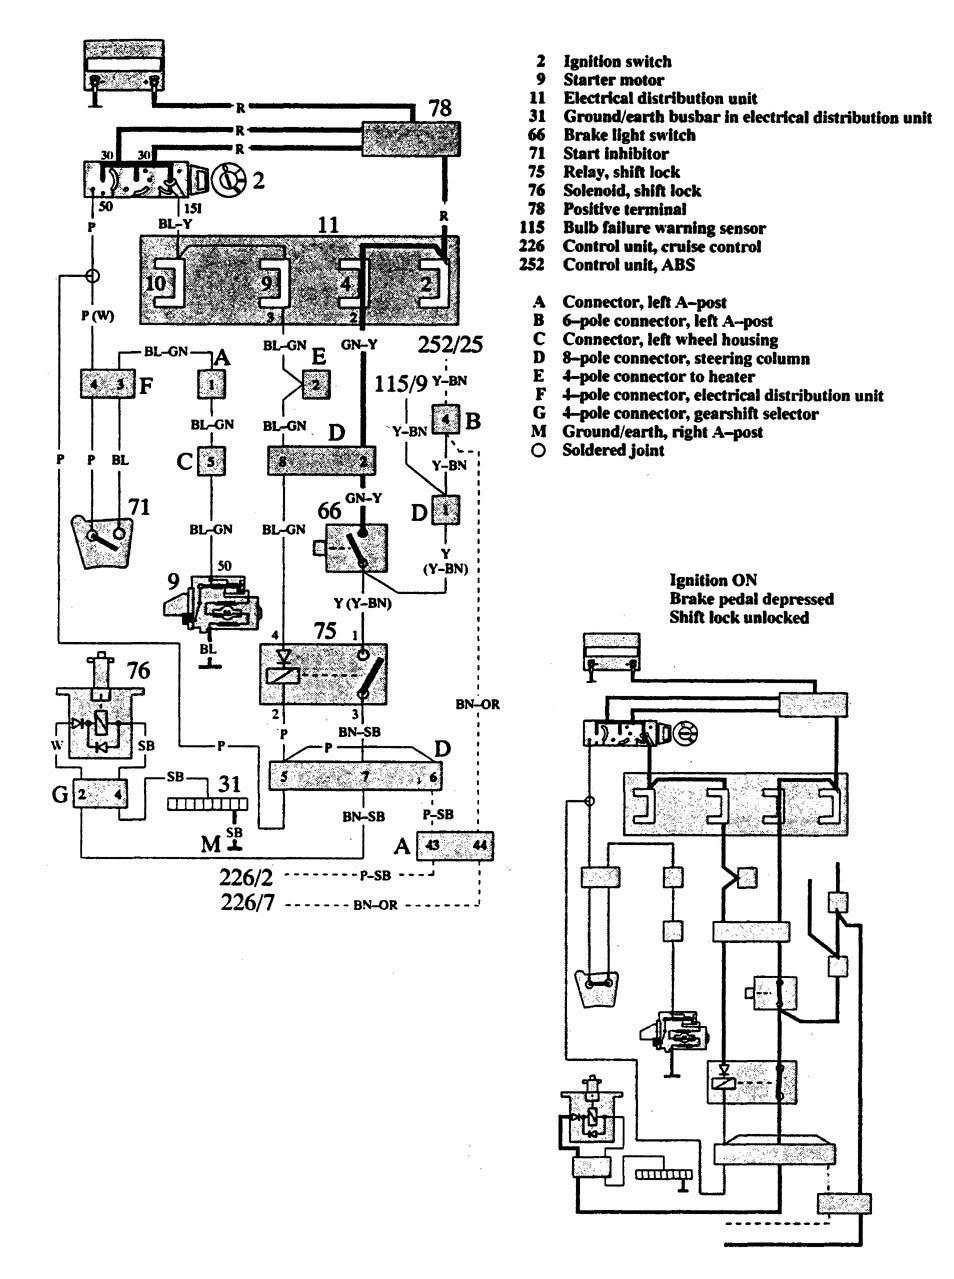 Diagram 93 Volvo 940 Wiring Diagram Full Version Hd Quality Wiring Diagram Edrewiringk Queidue It